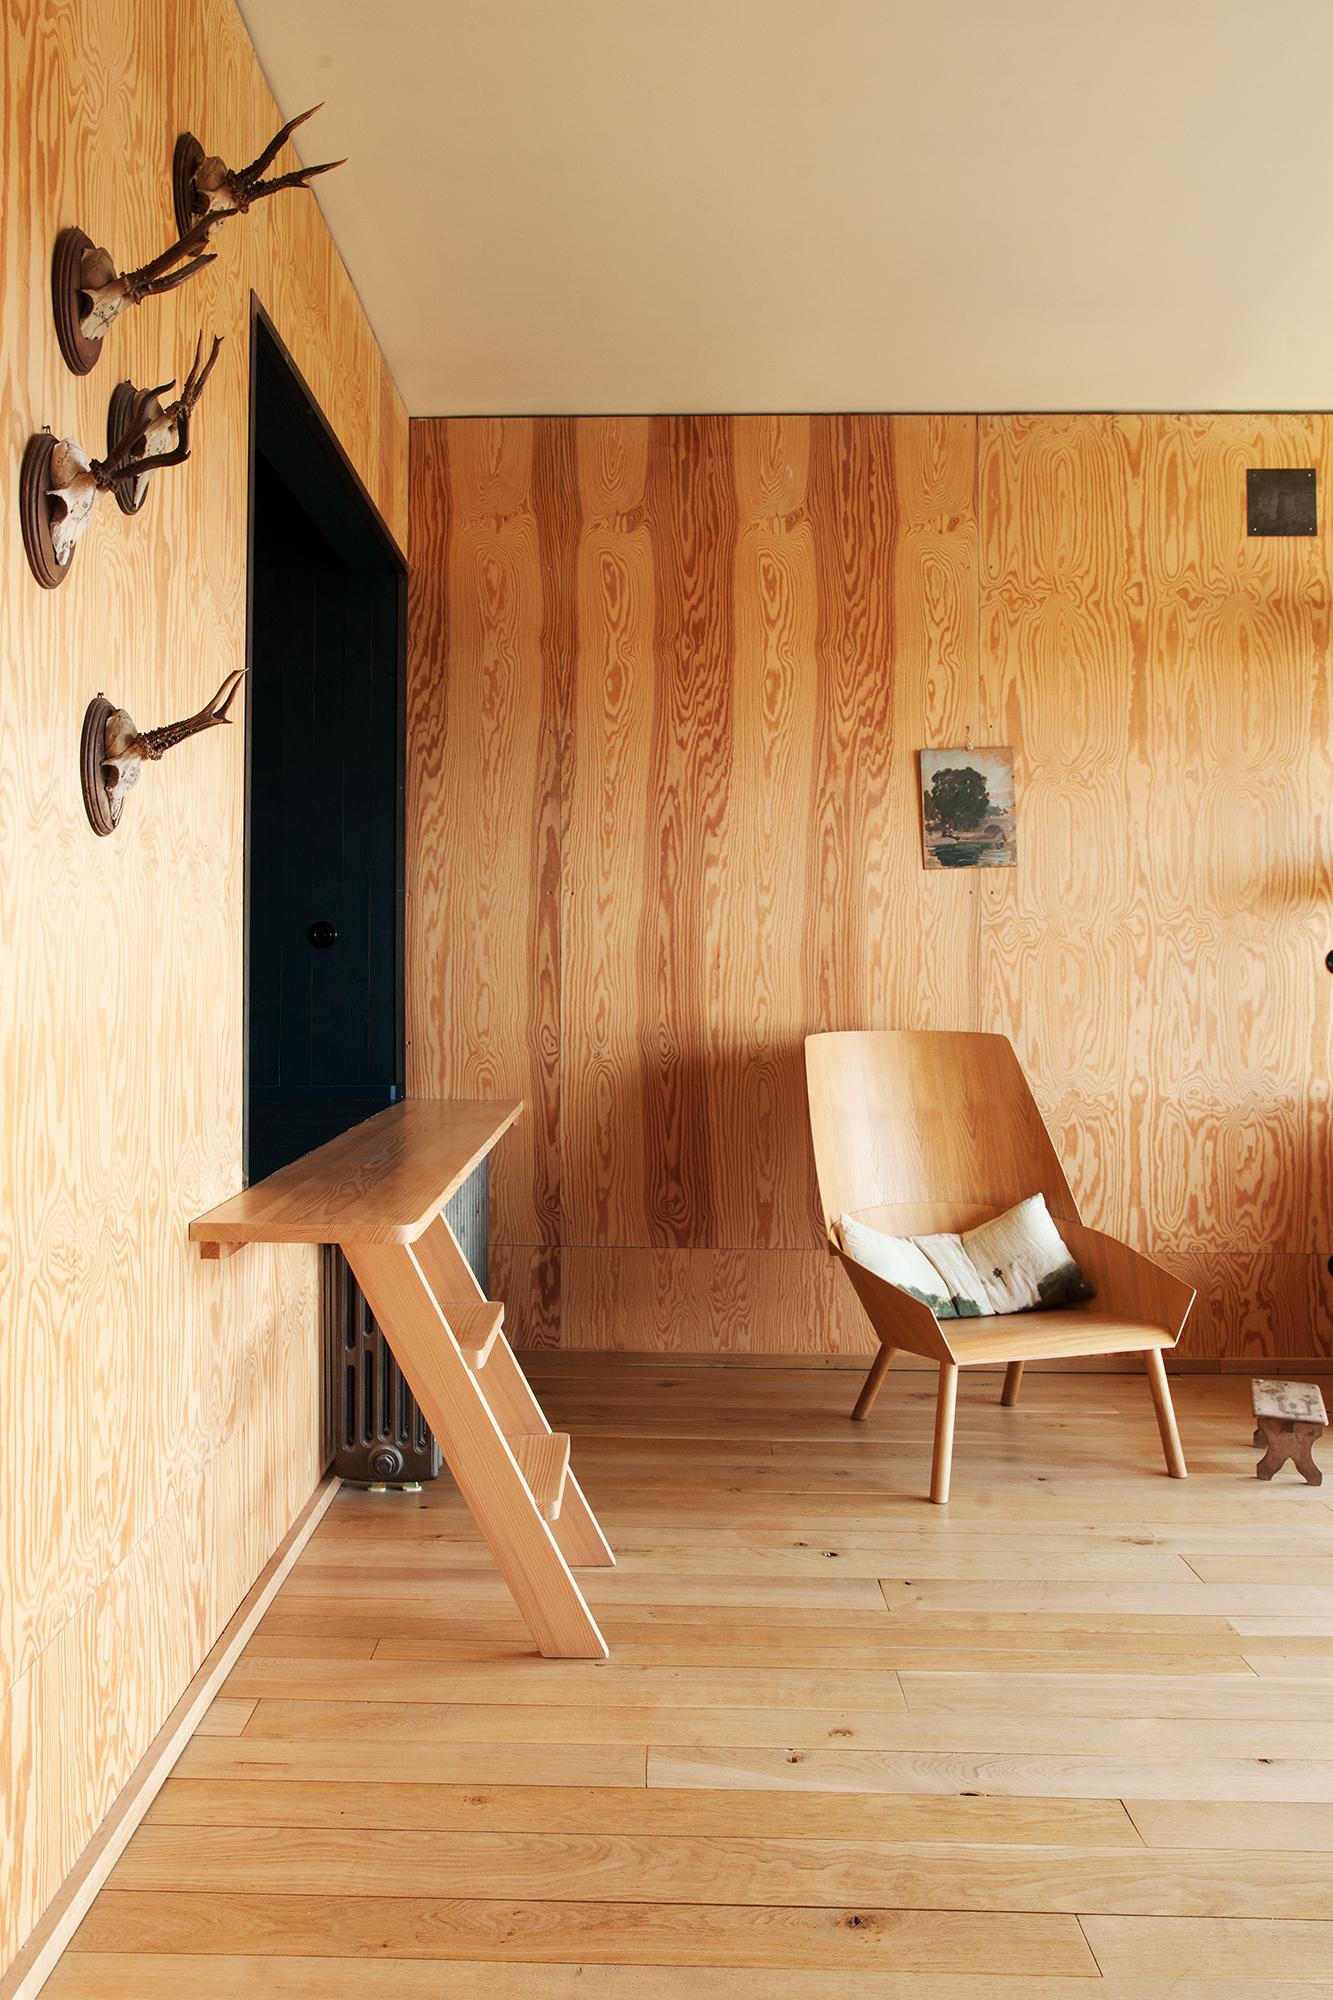 Chambre d'enfant – Anne Hubert